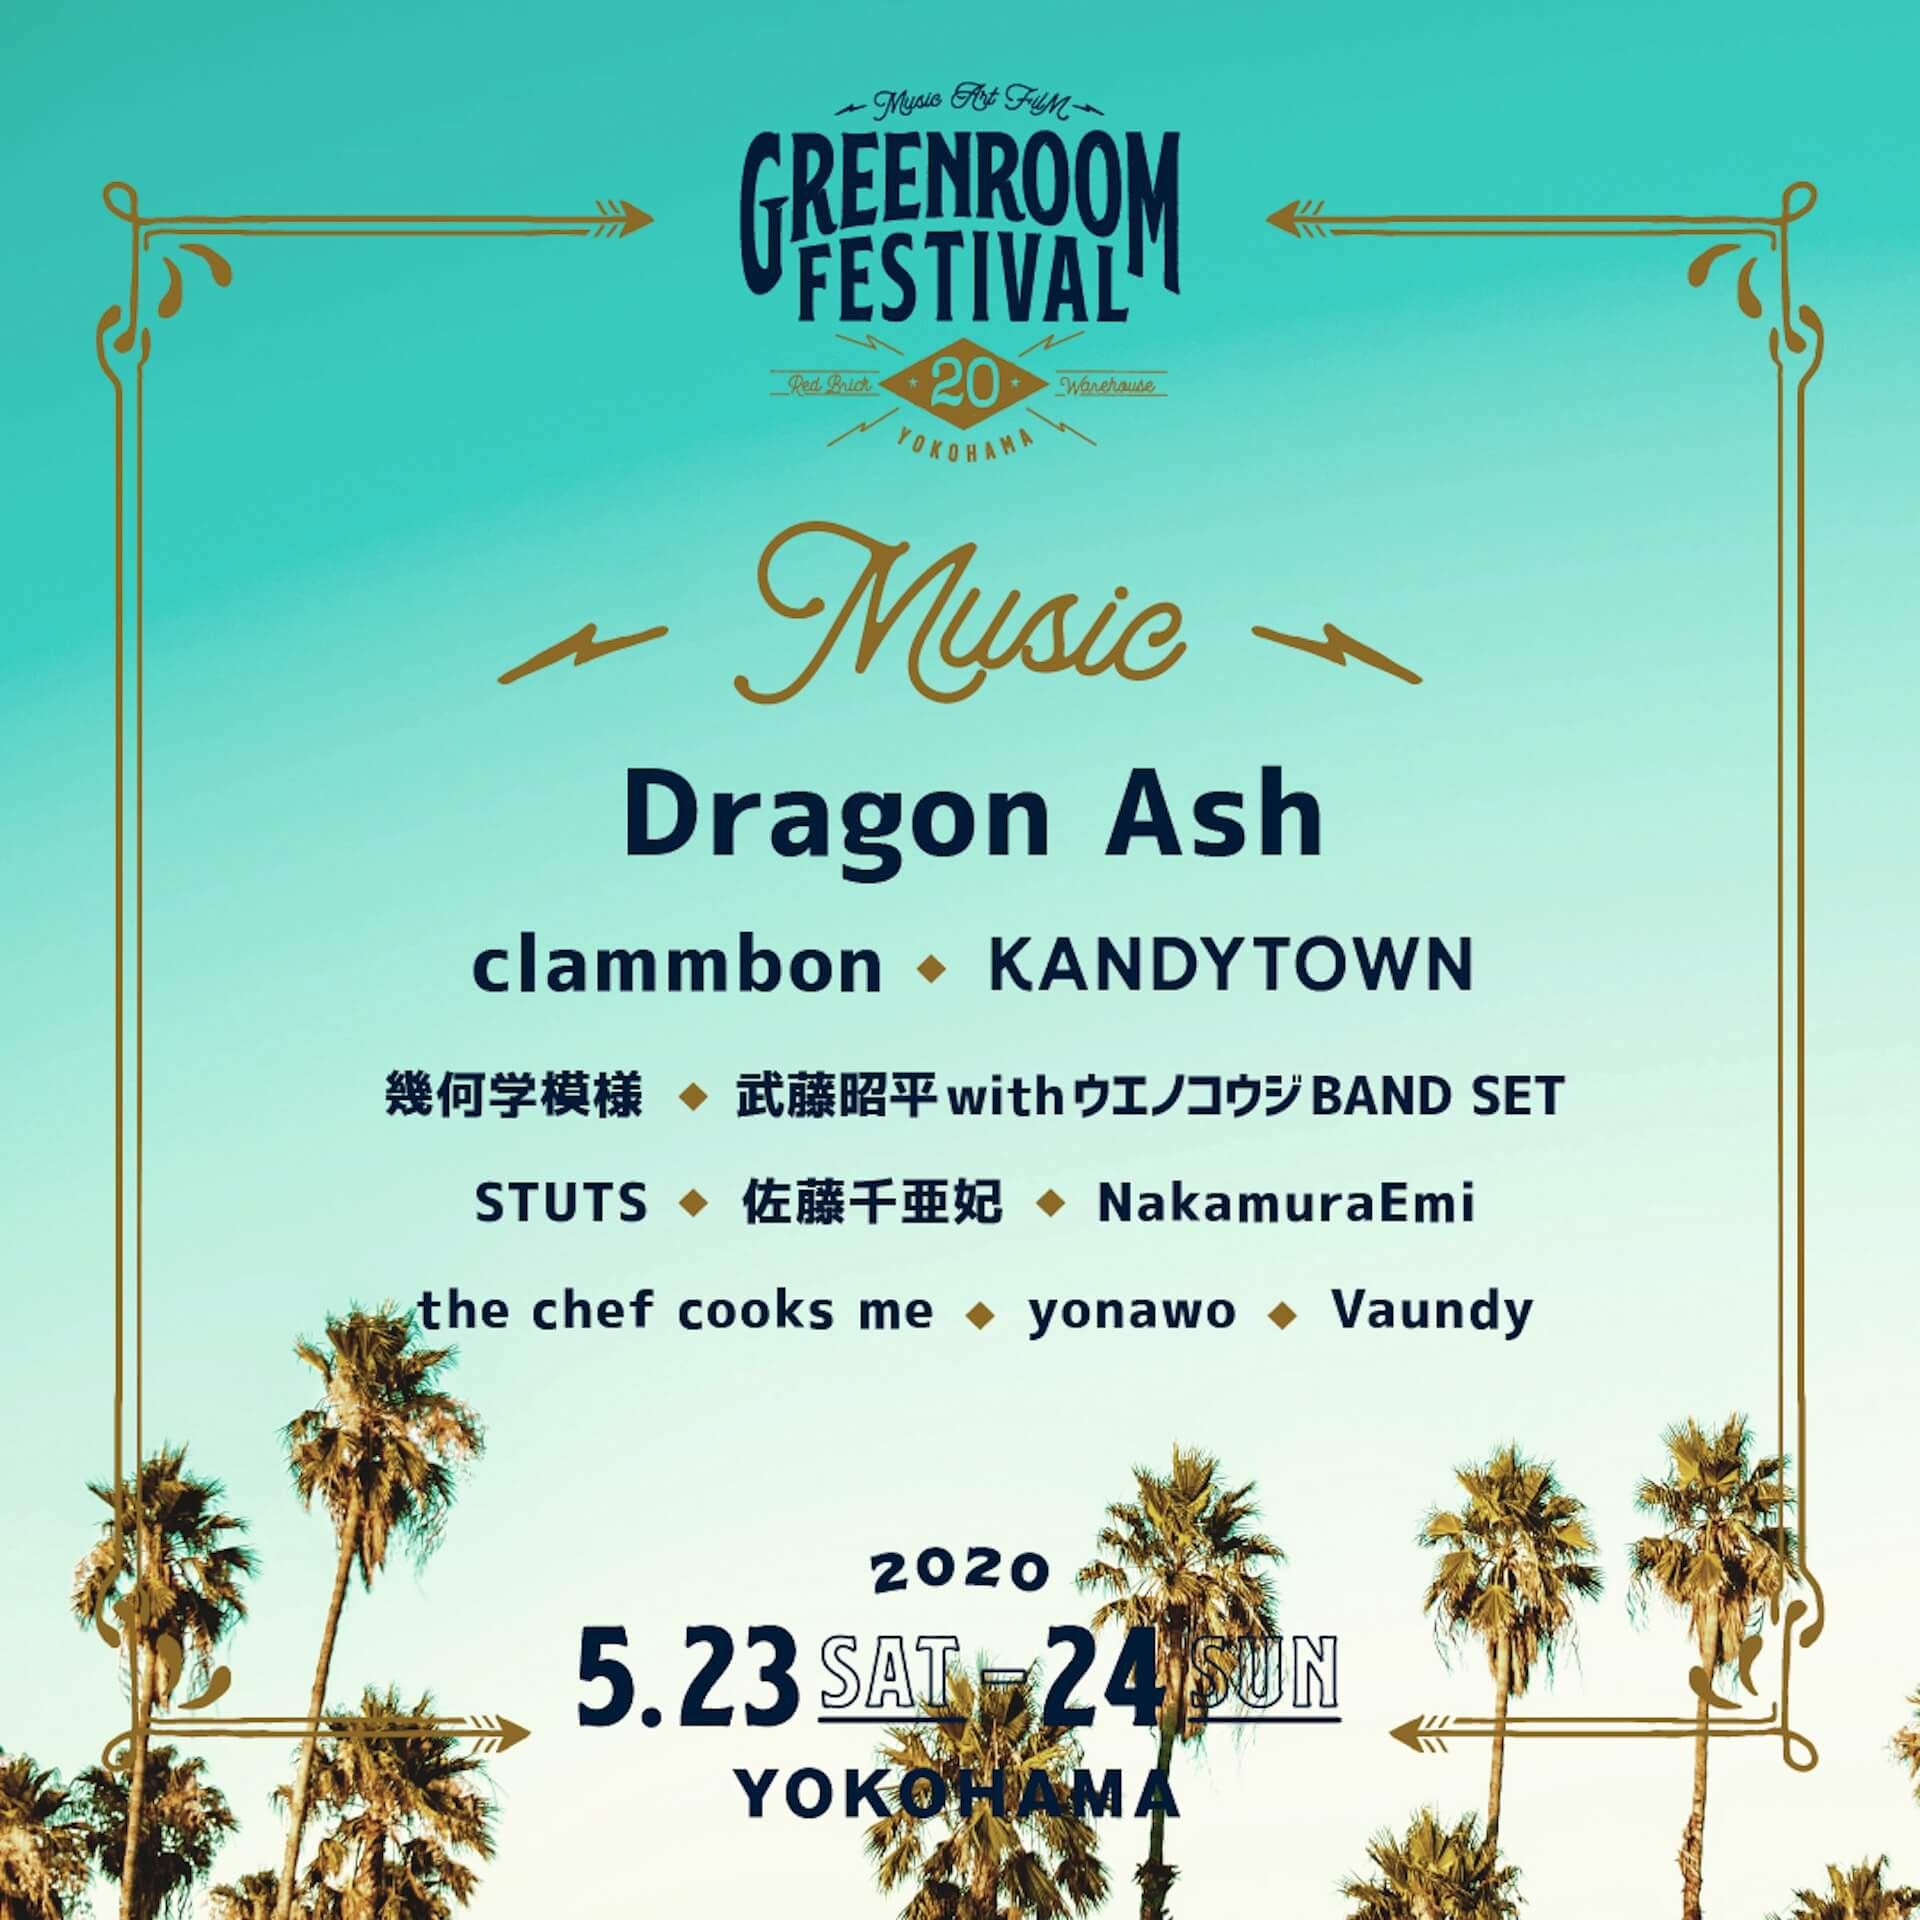 <GREENROOM FESTIVAL'20>第3弾アーティスト&日割り情報発表!Dragon Ash、幾何学模様、KANDYTOWNが登場 music200312_greenroom_14